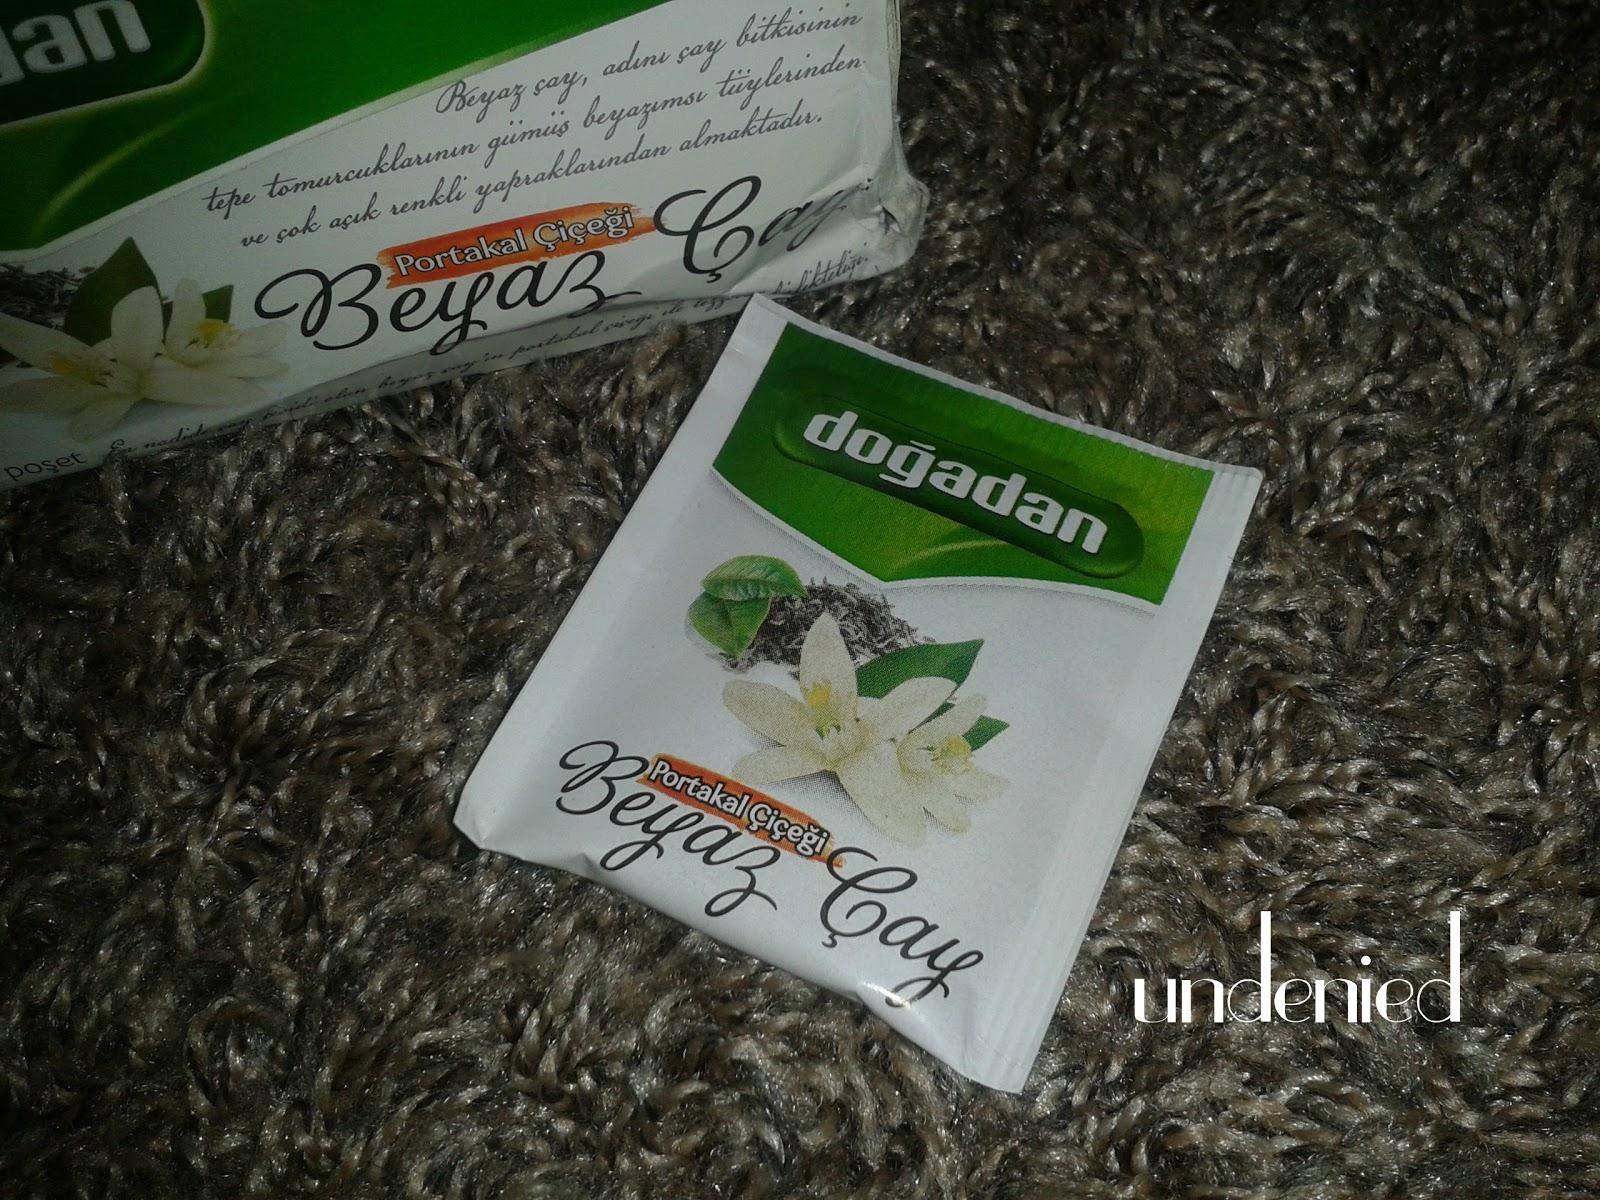 Bergamotlu Yeşil Çay Zayıflatır Mı